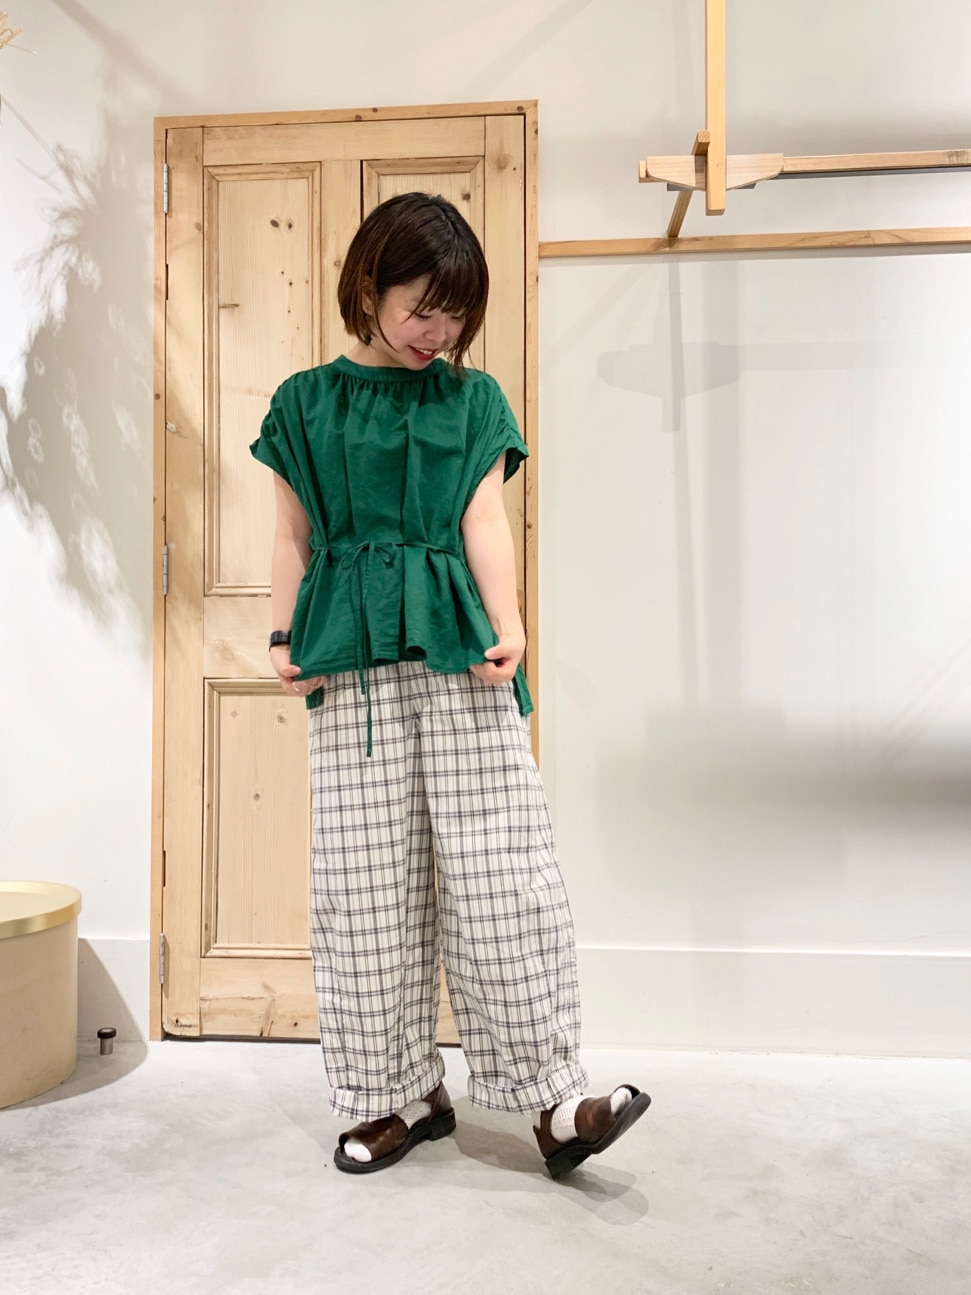 Malle chambre de charme 調布パルコ 身長:153cm 2020.08.15